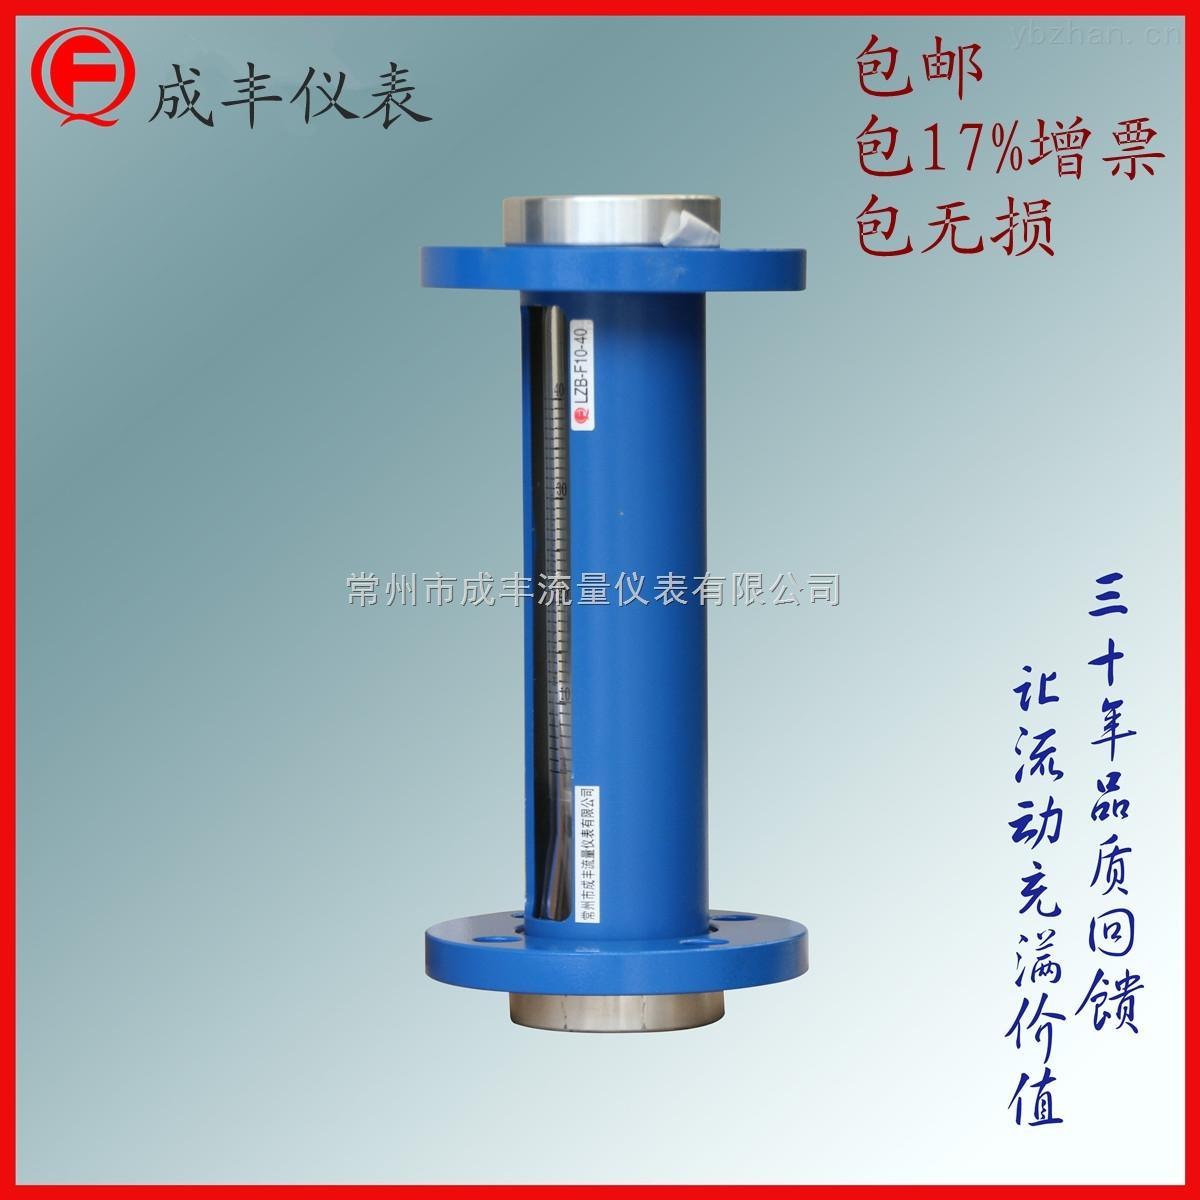 F10-40-普通型玻璃转子流量计 碳钢外壳价格便宜